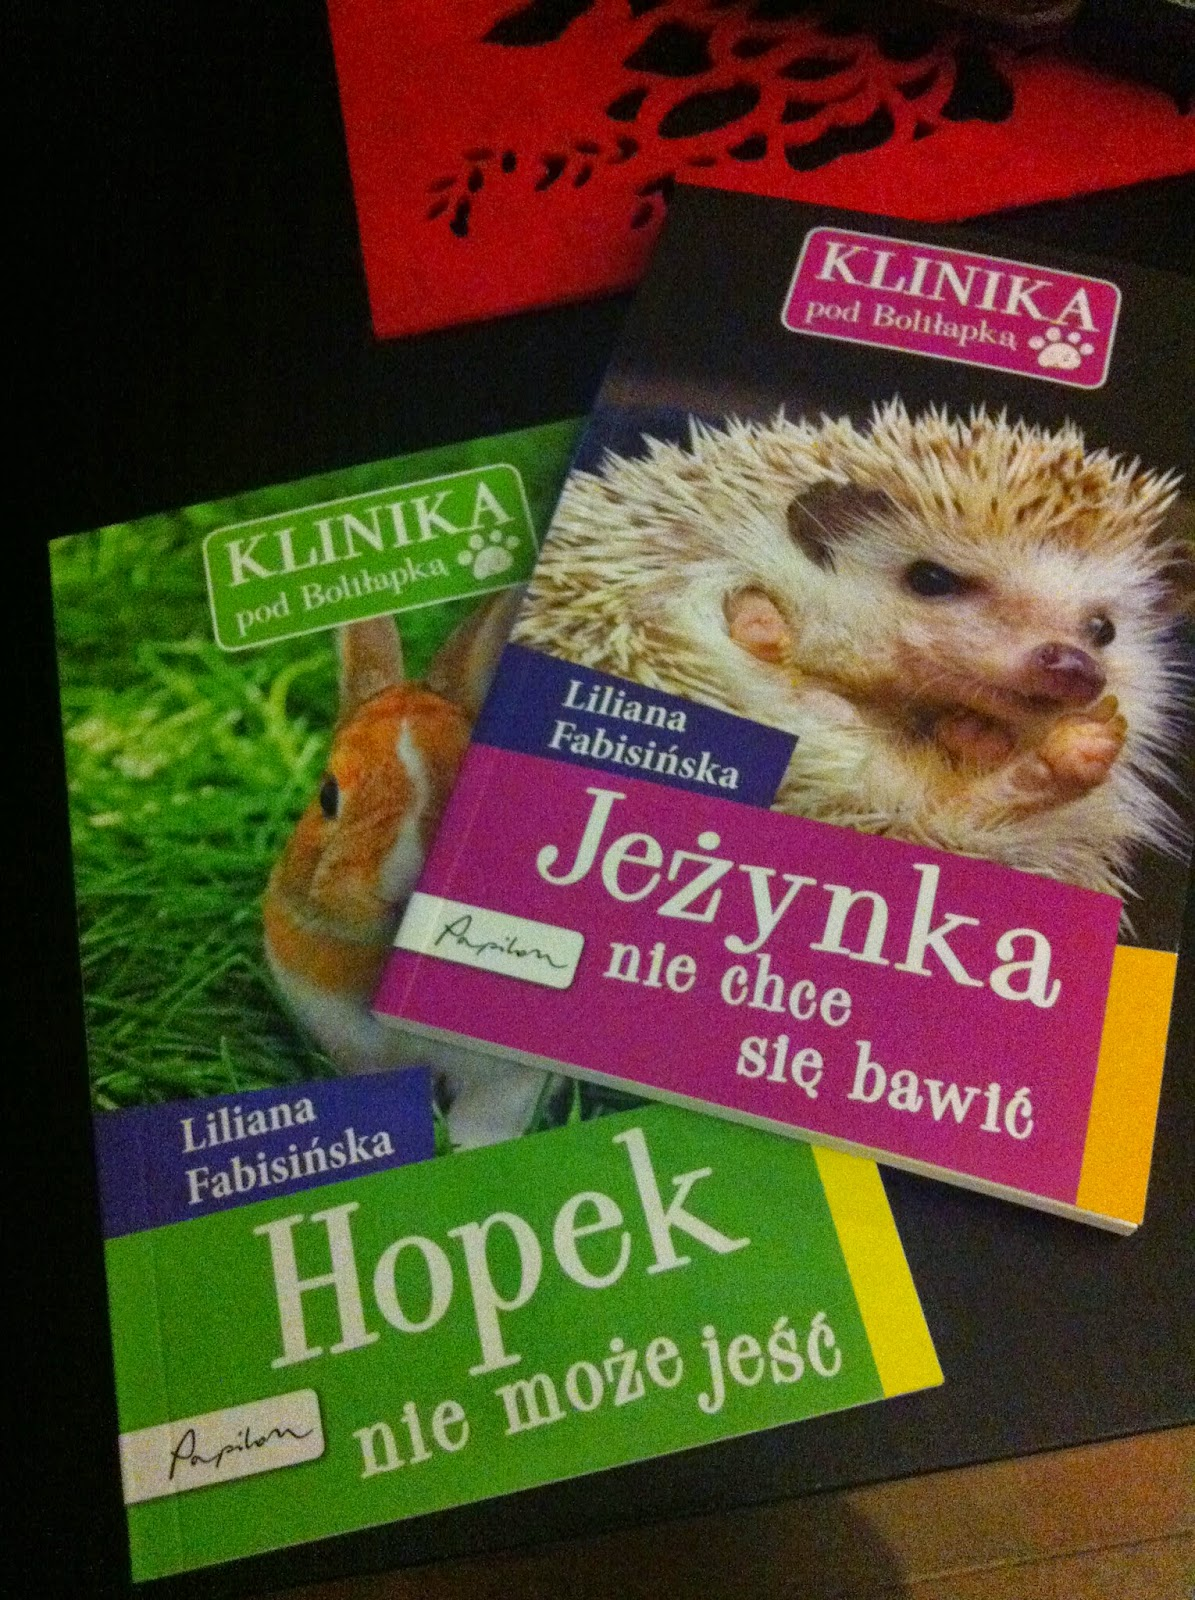 http://markietanka-mojeksiazki.blogspot.com/2014/10/klinika-pod-boliapka-liliana-fabisinska.html